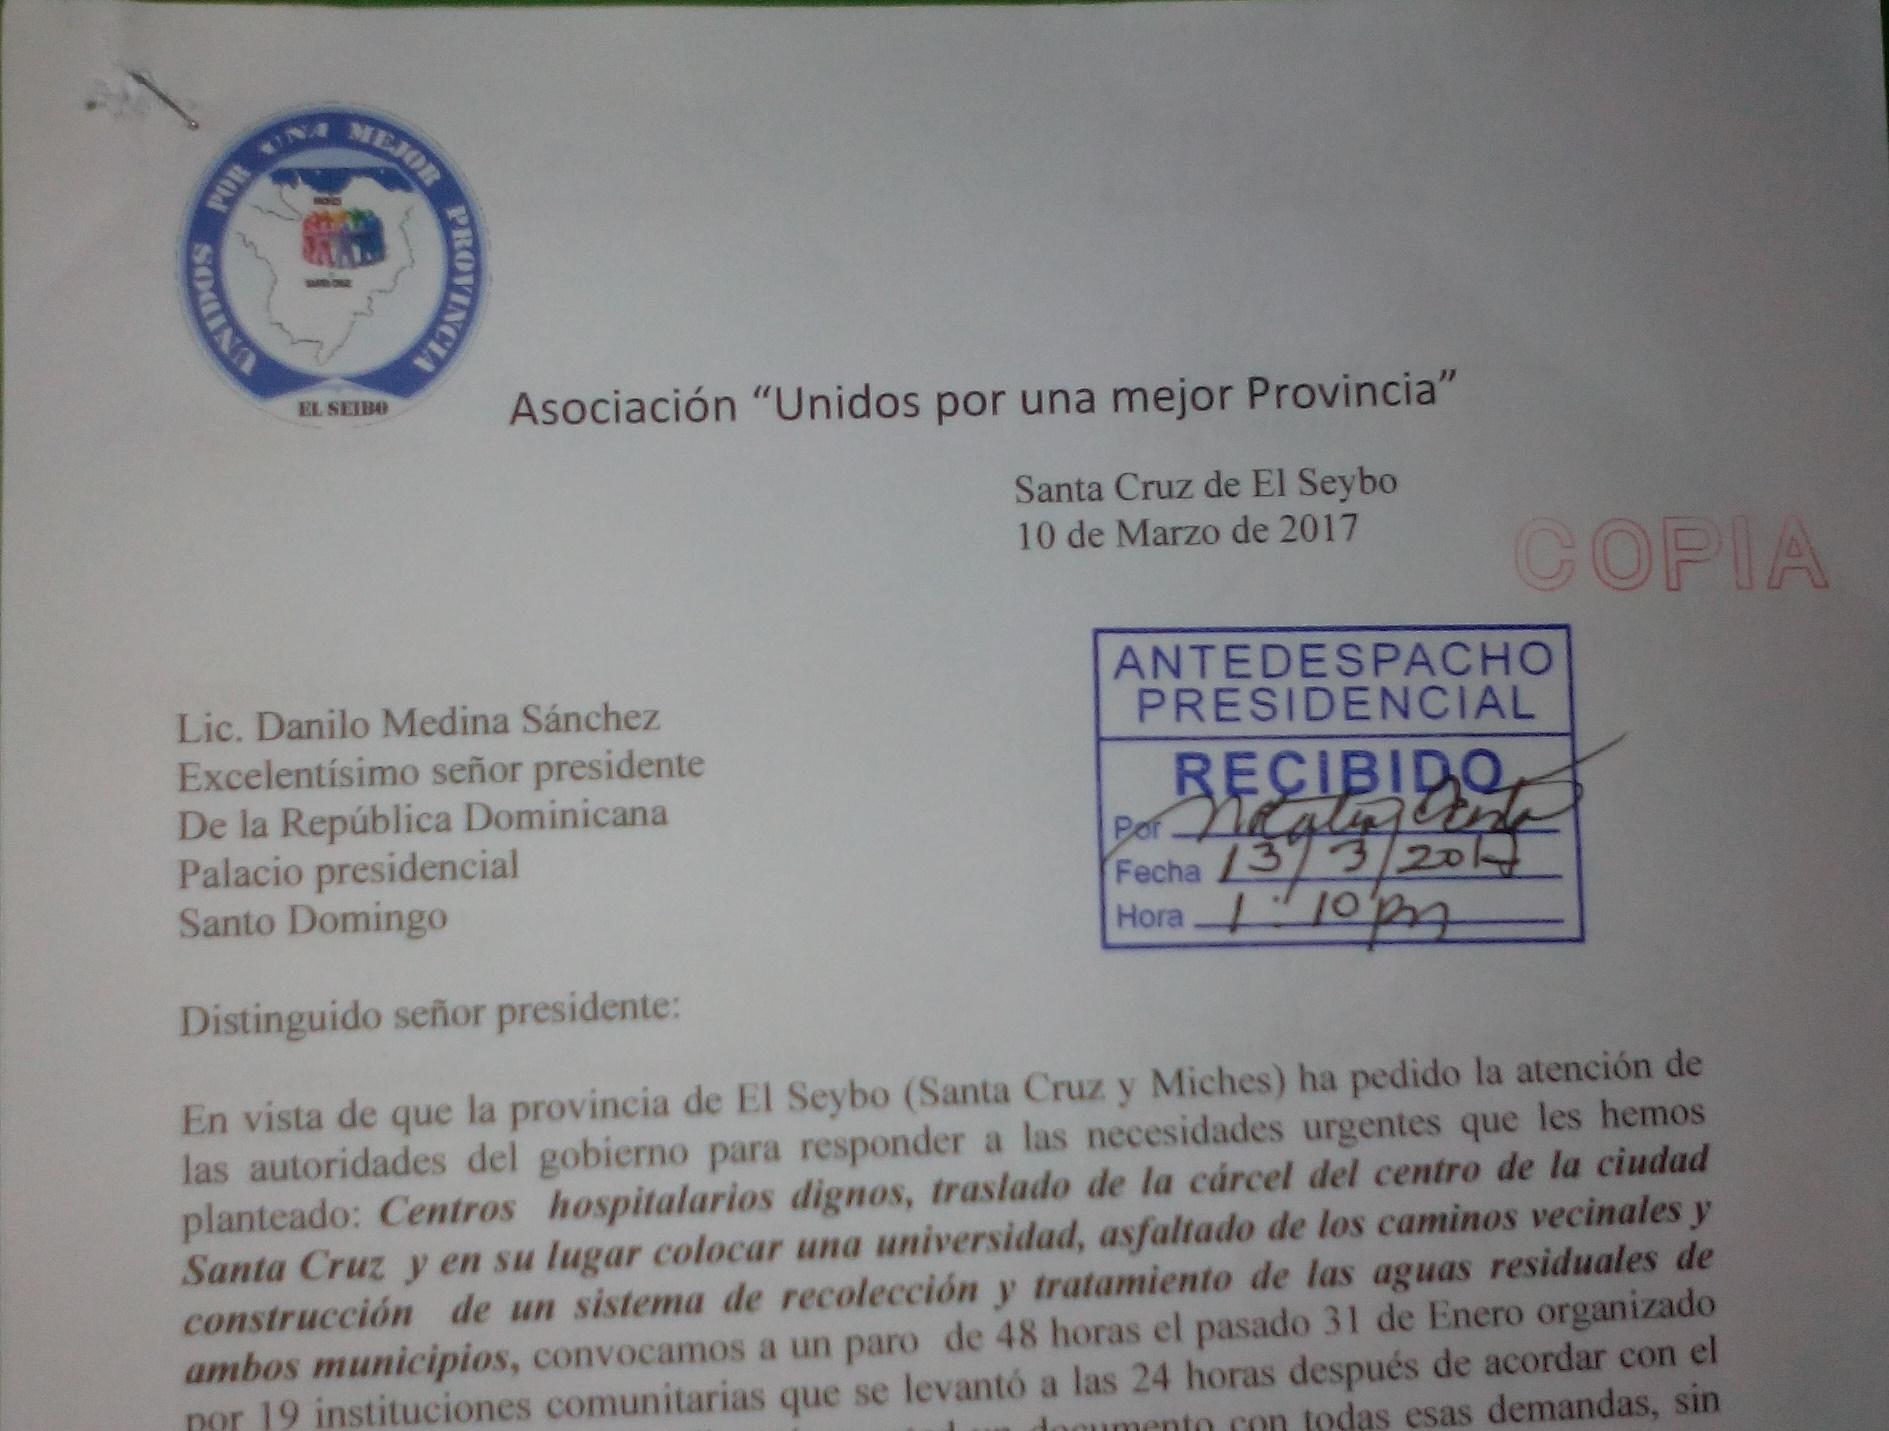 Gobernador entrega carta a la Presidencia de la Republica